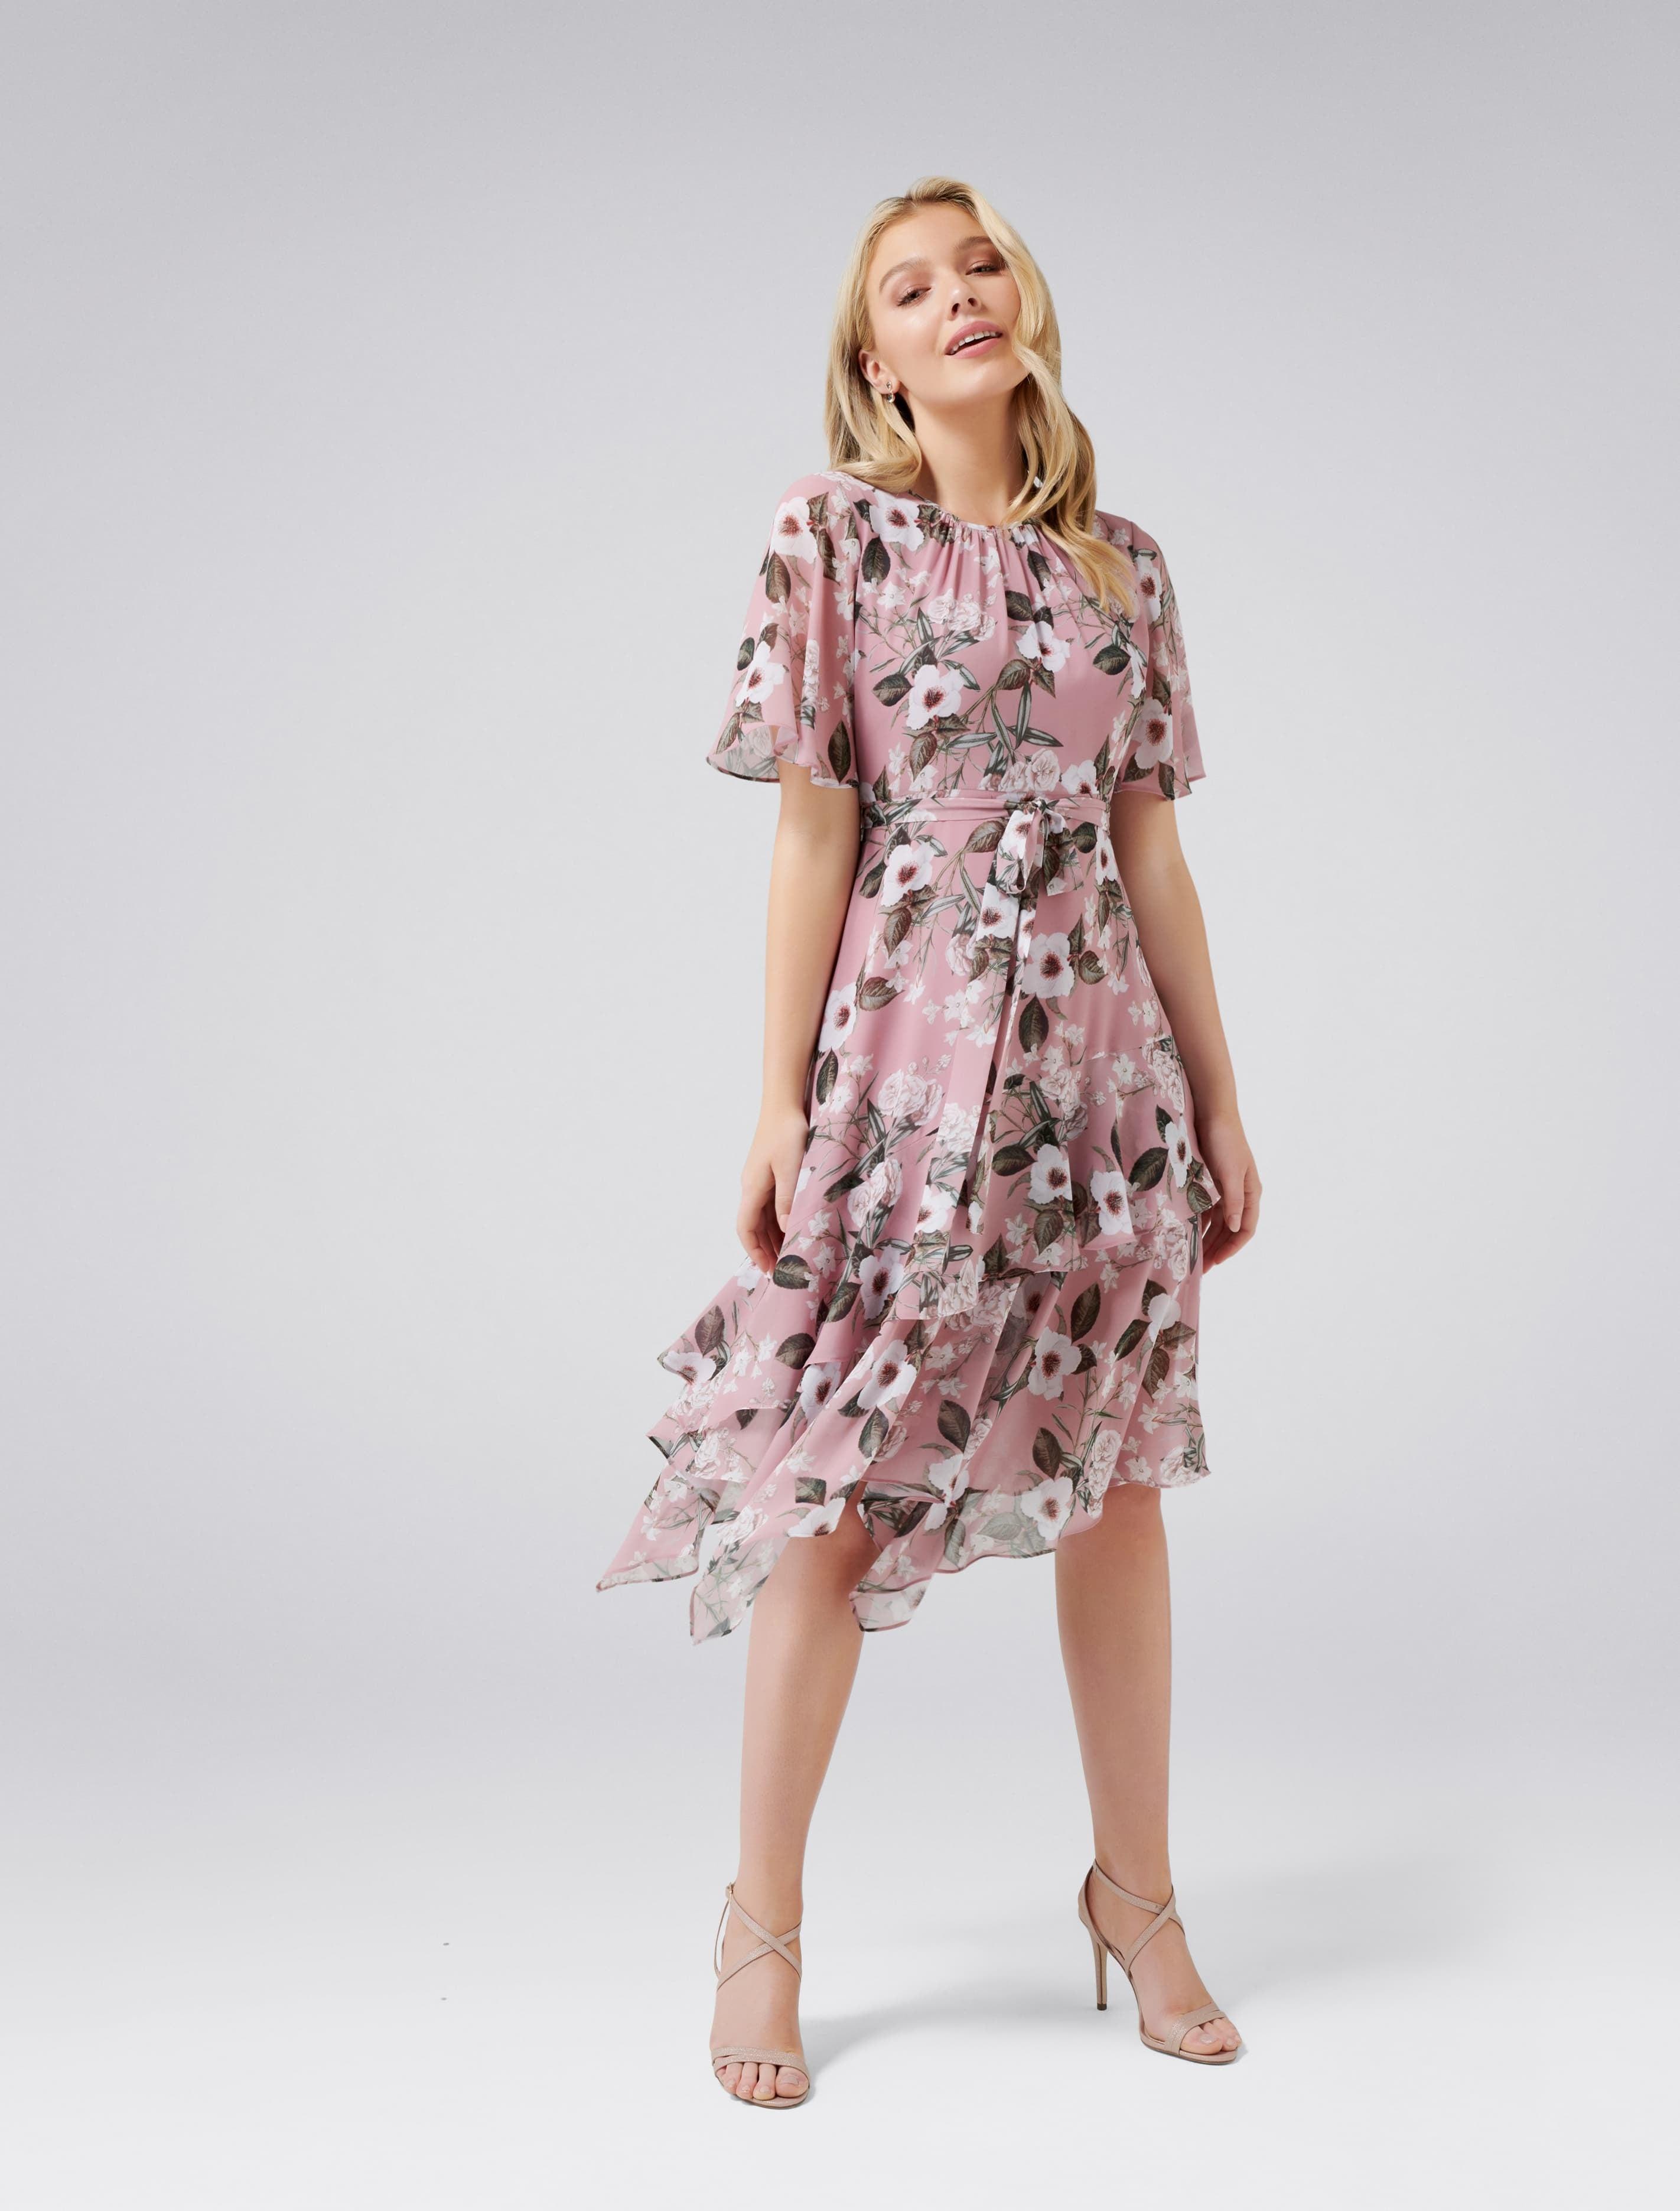 Vintage 1920s Dresses – Where to Buy Nancy Petite Cape Sleeve Midi Dress - Mauve Blush Blooms - 384 $99.95 AT vintagedancer.com